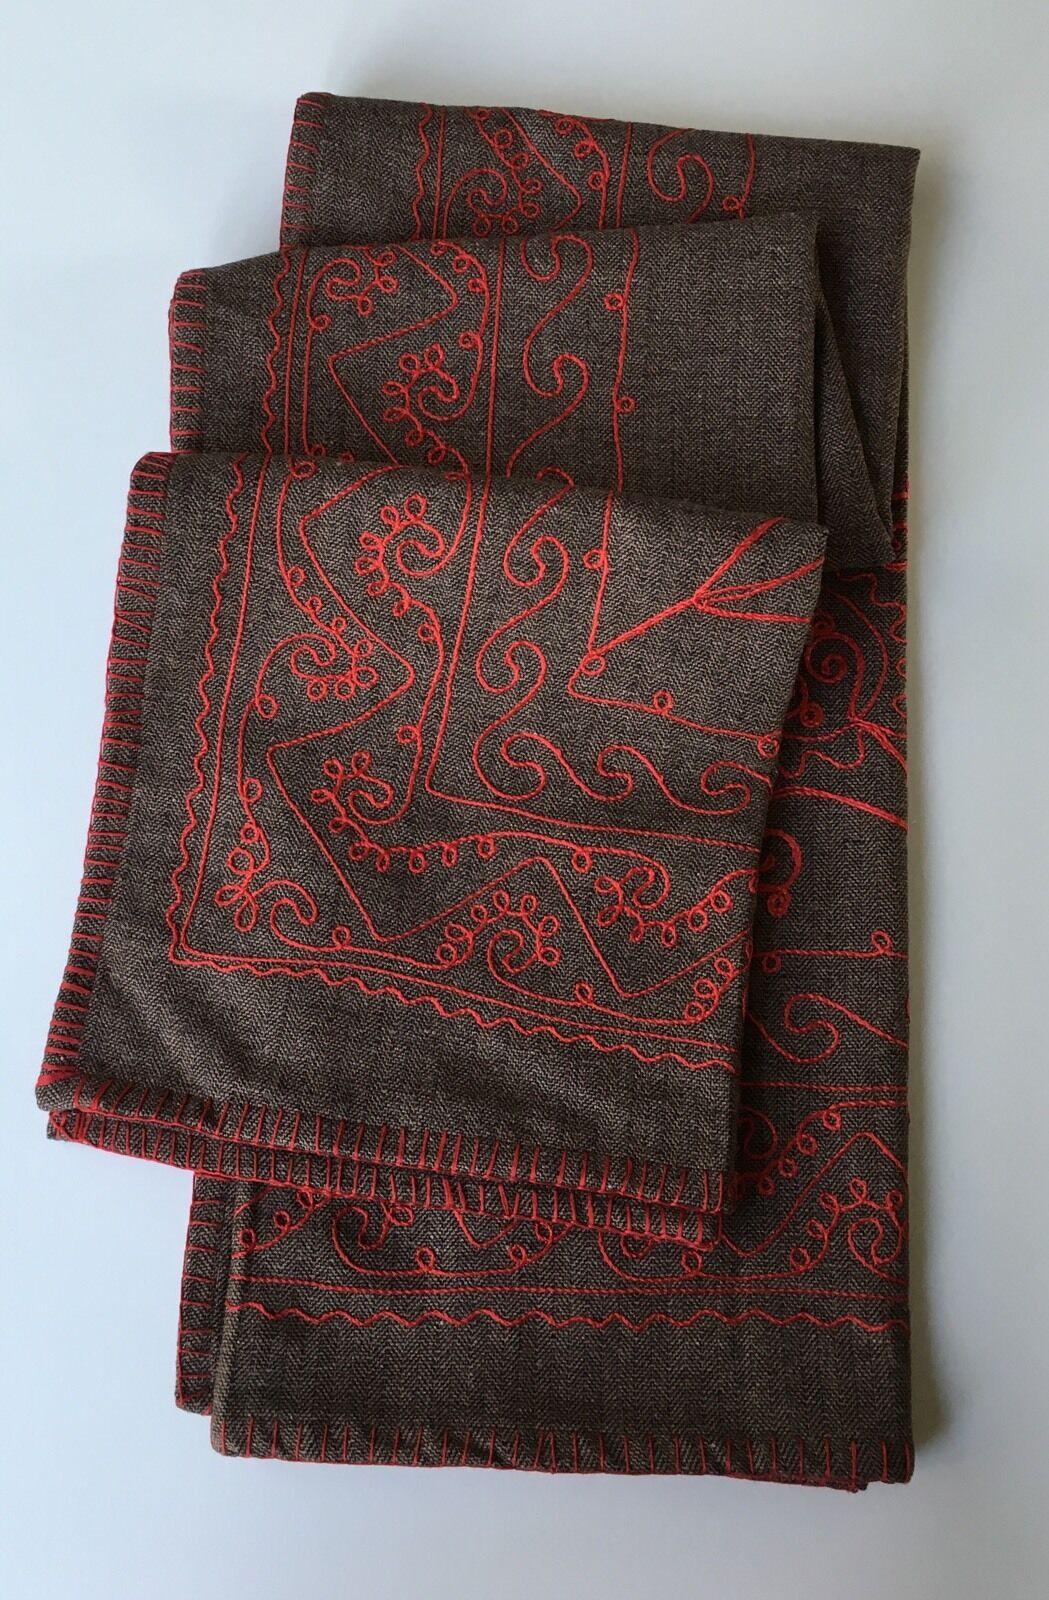 Wisteria brown & grey herringbone blanket w  red embroidery & silky satin lining